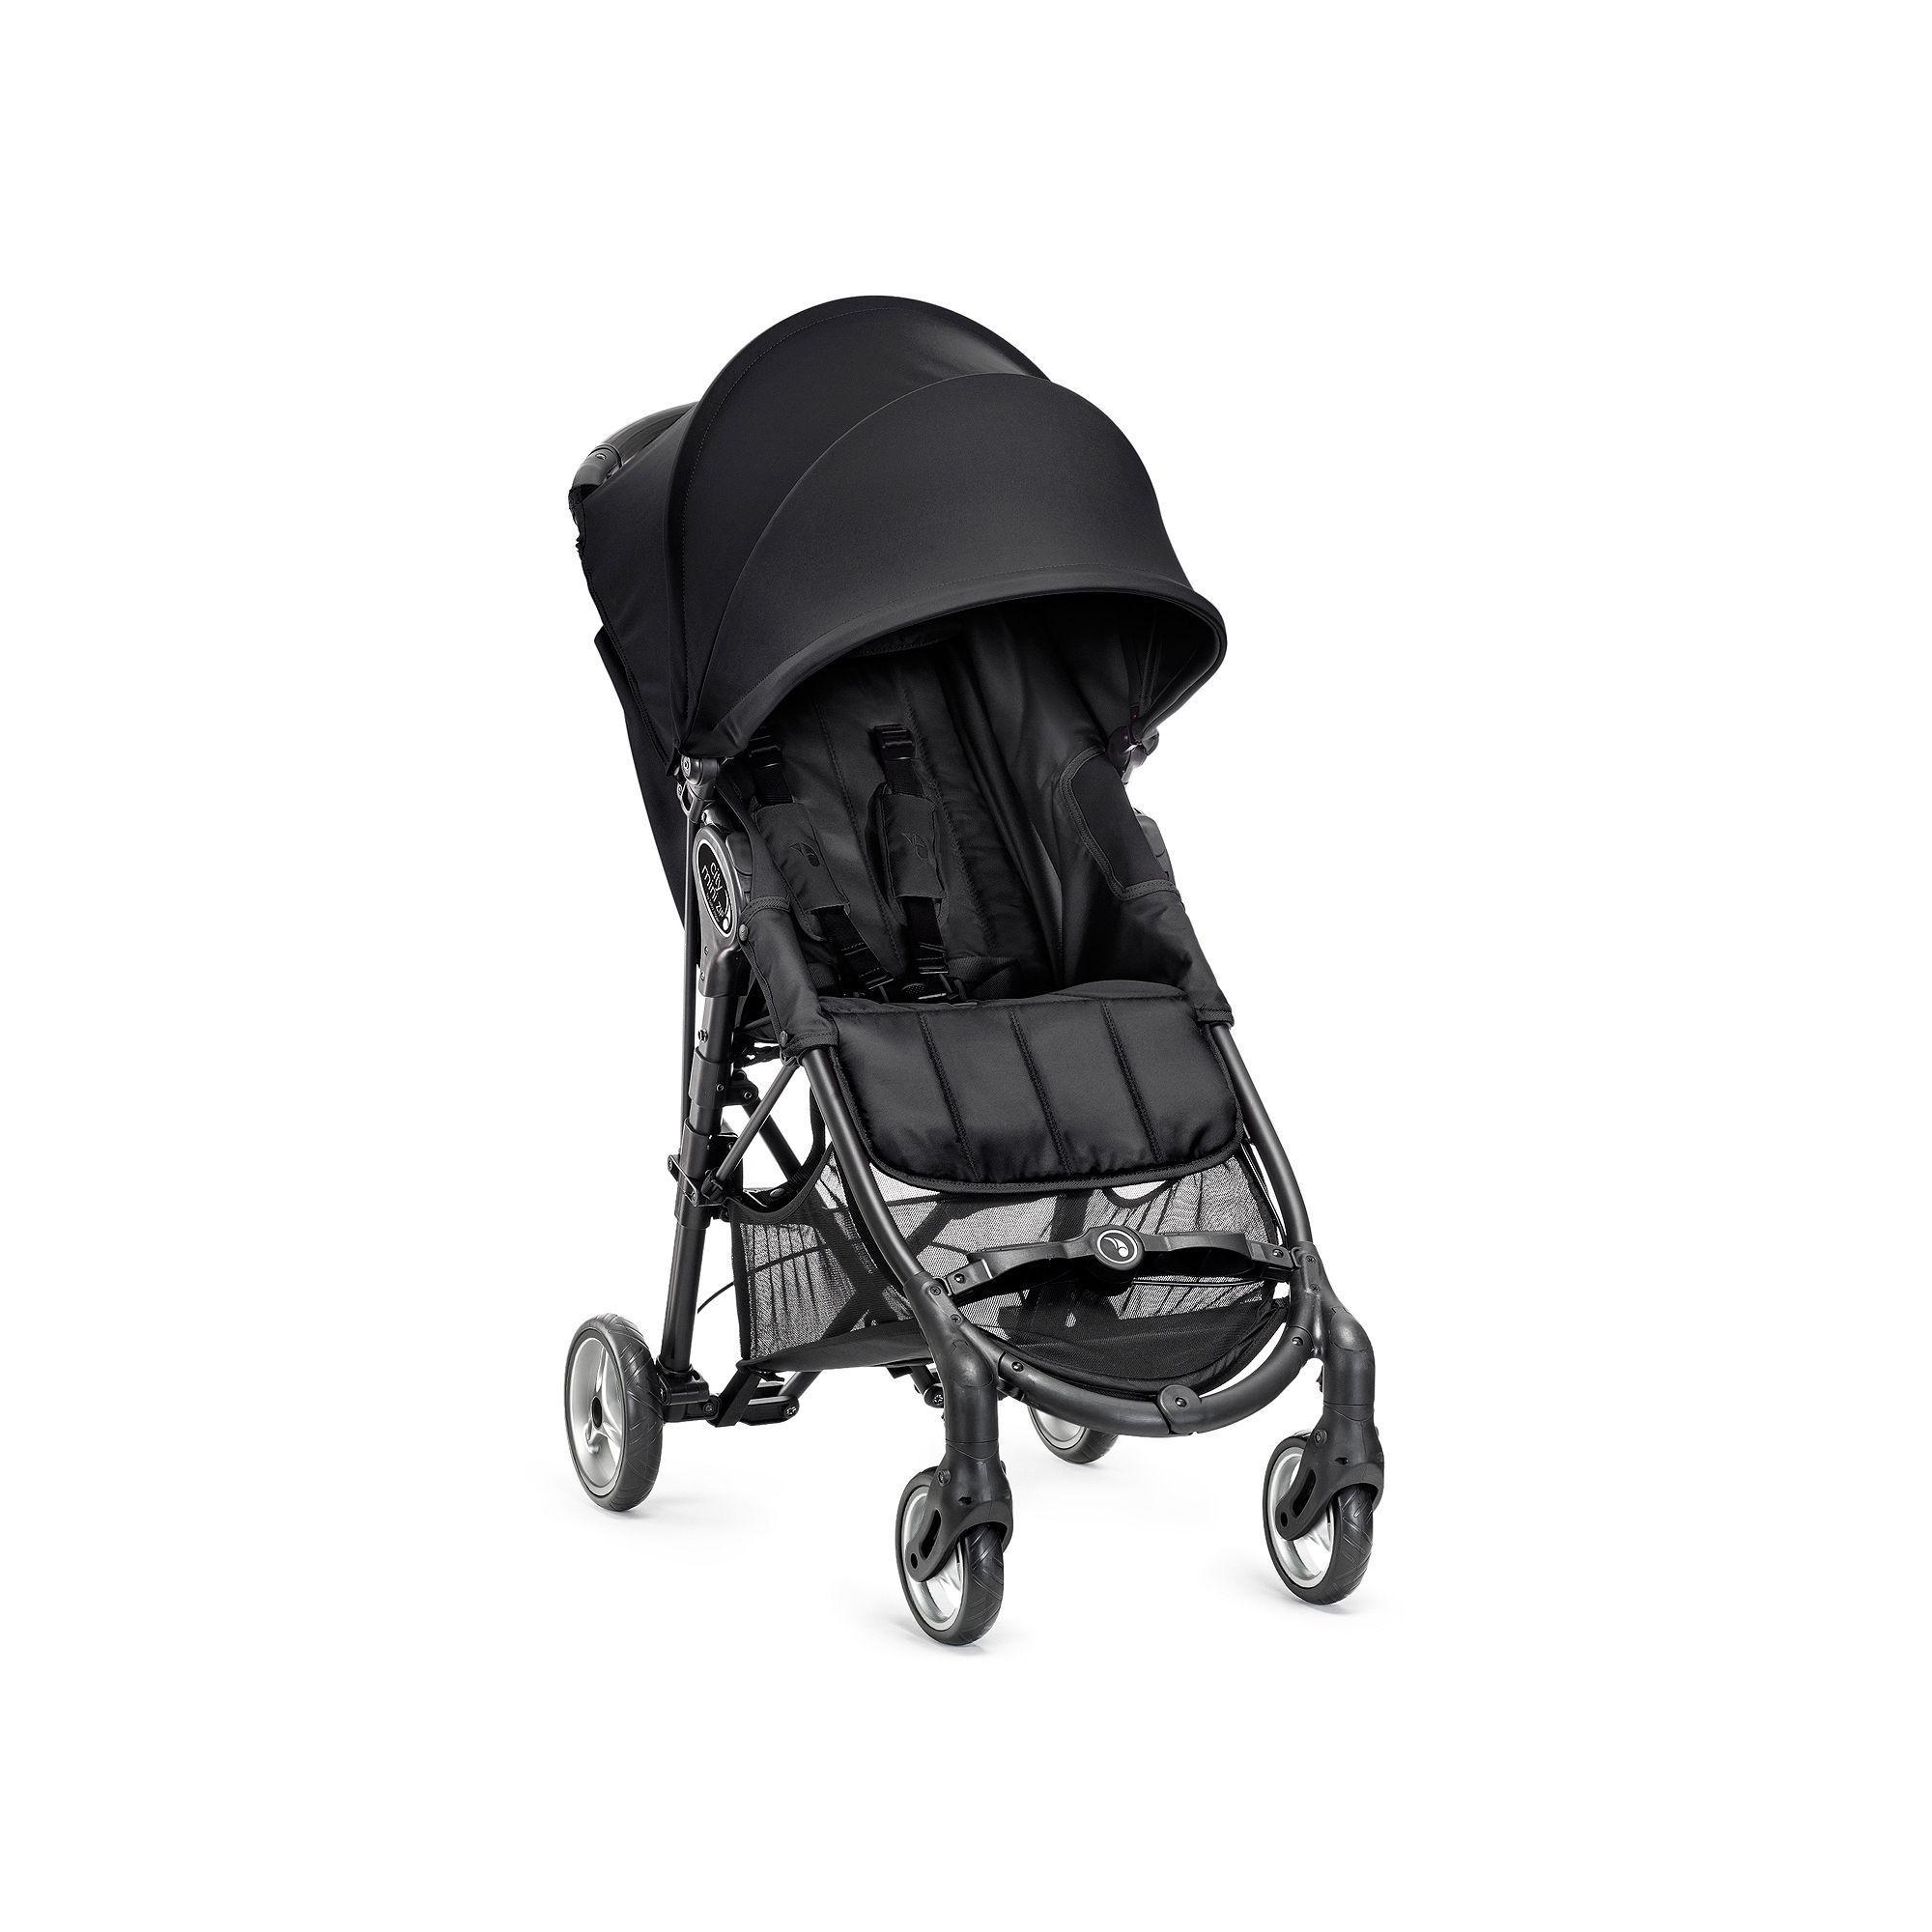 Baby Jogger City Mini ZIP Single Stroller, Black Baby